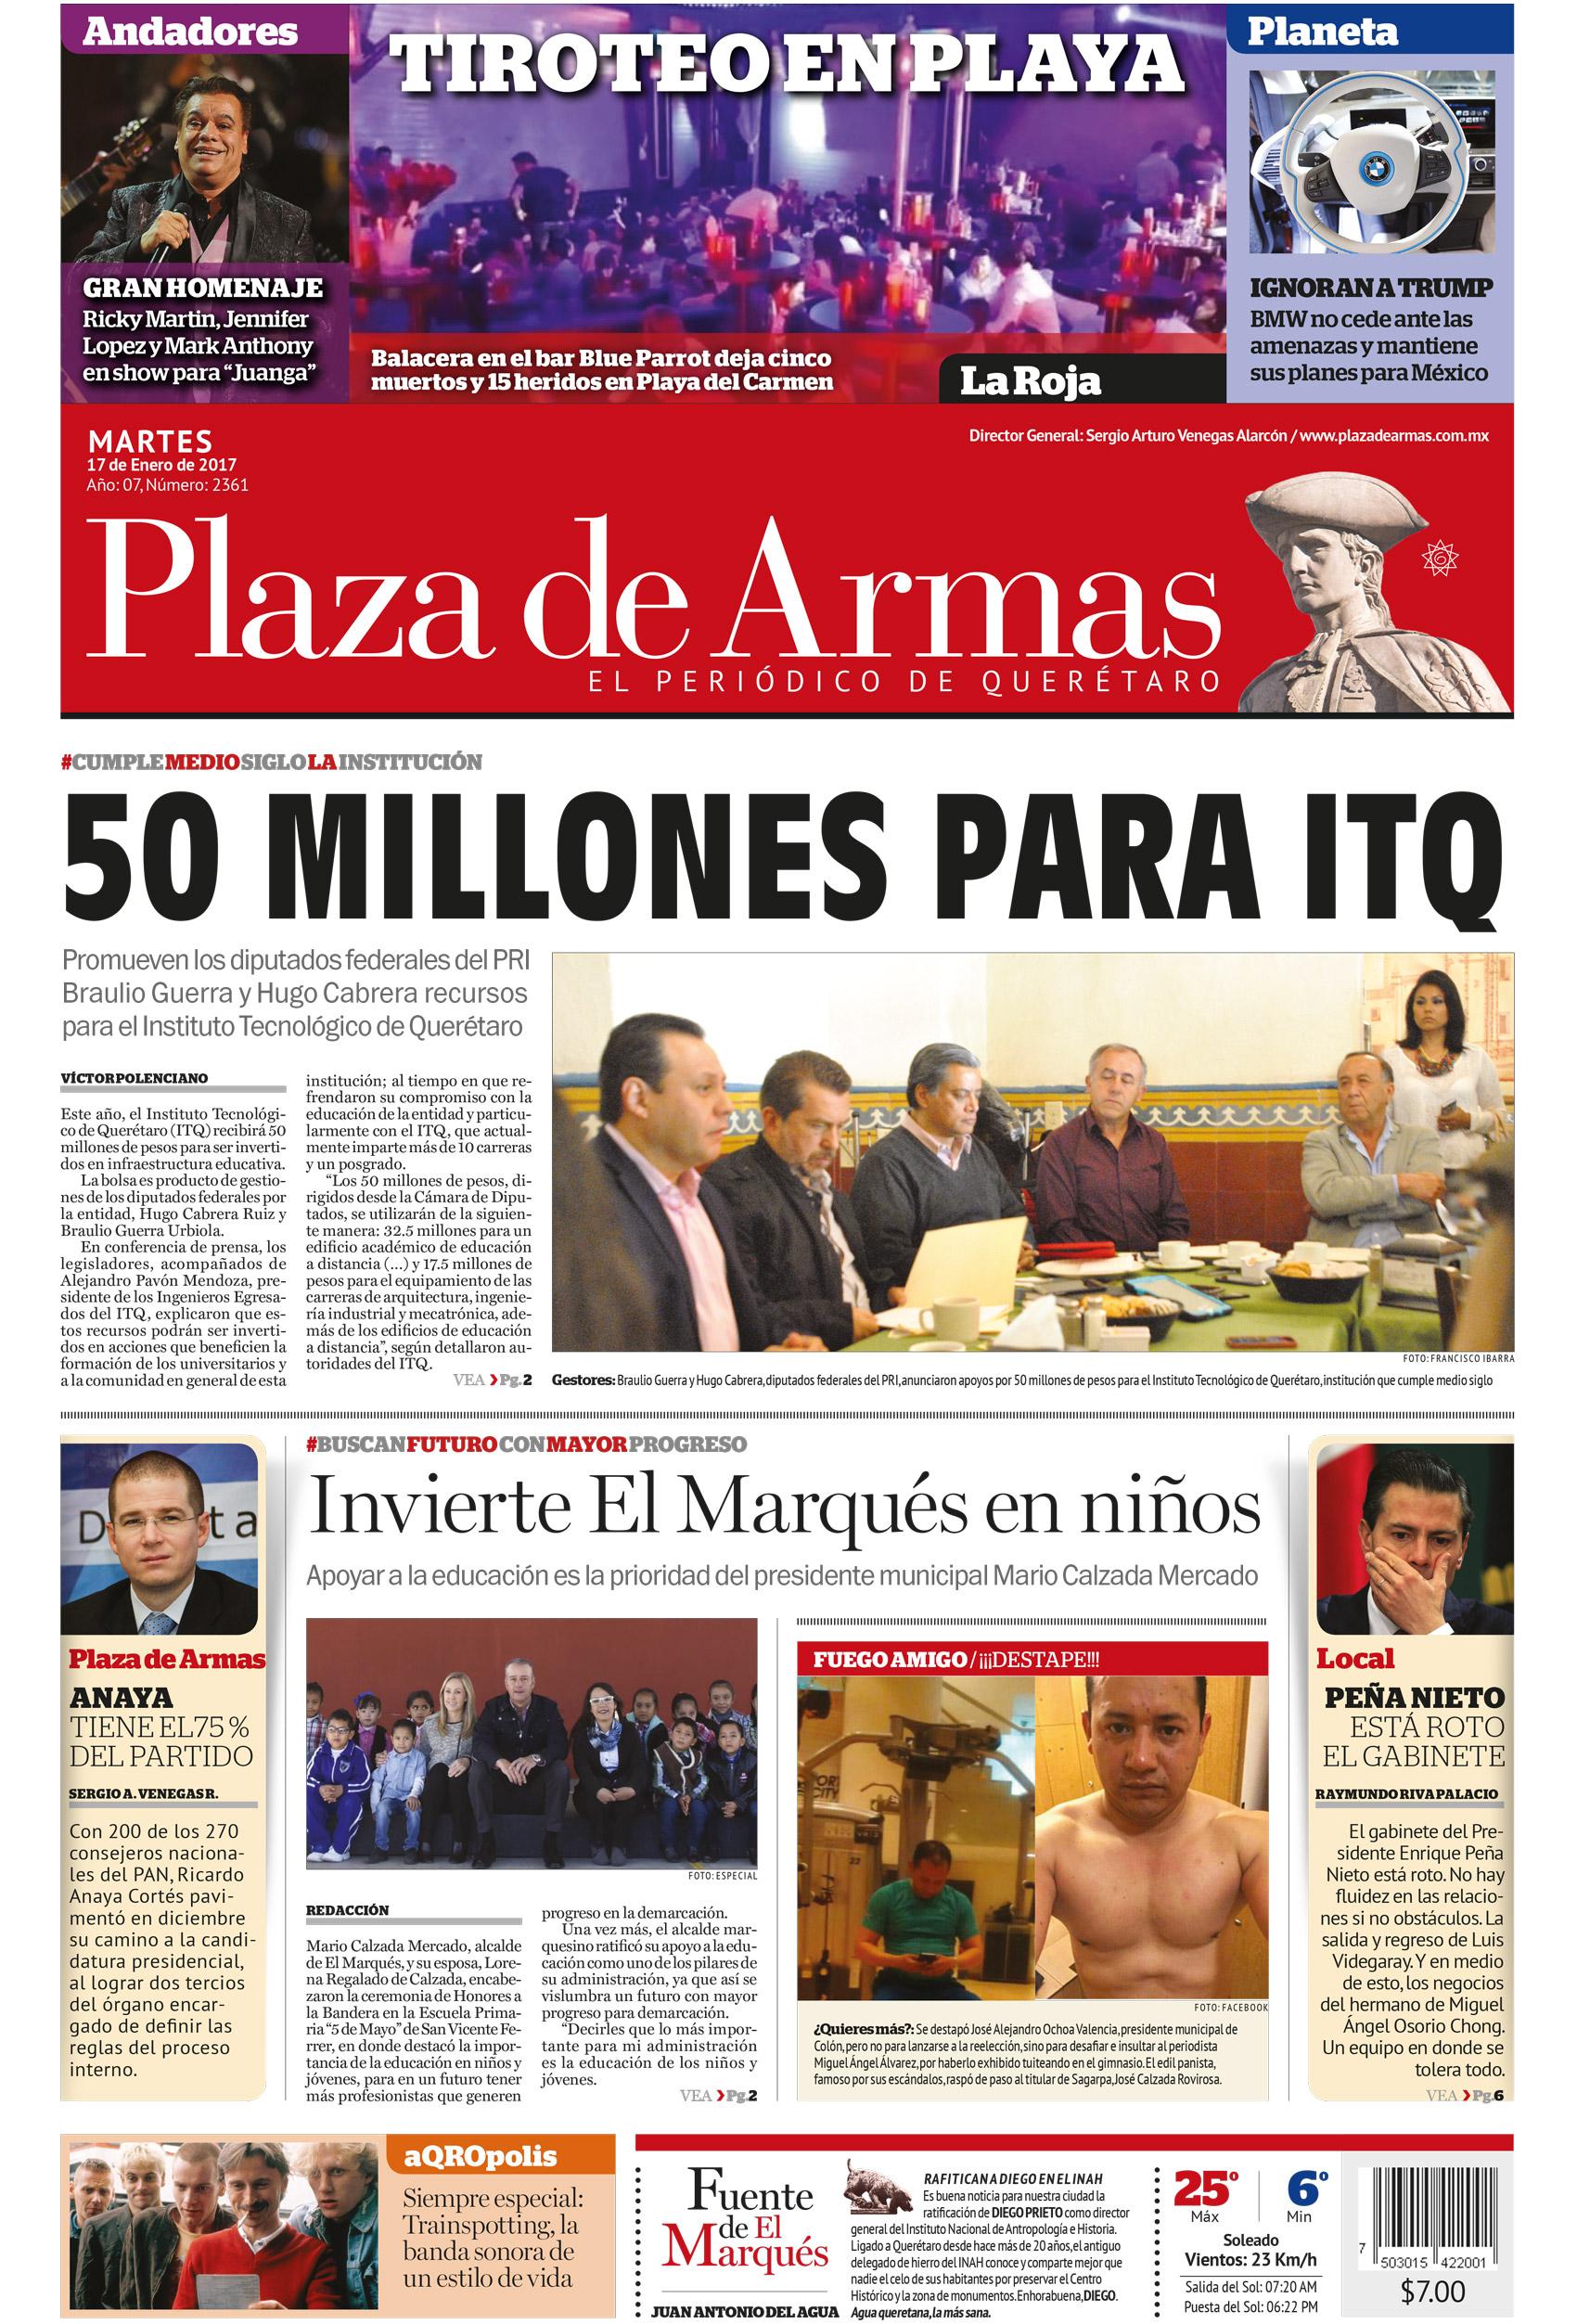 PORTADA DE HOY - Plaza de Armas   QuerétaroPlaza de Armas